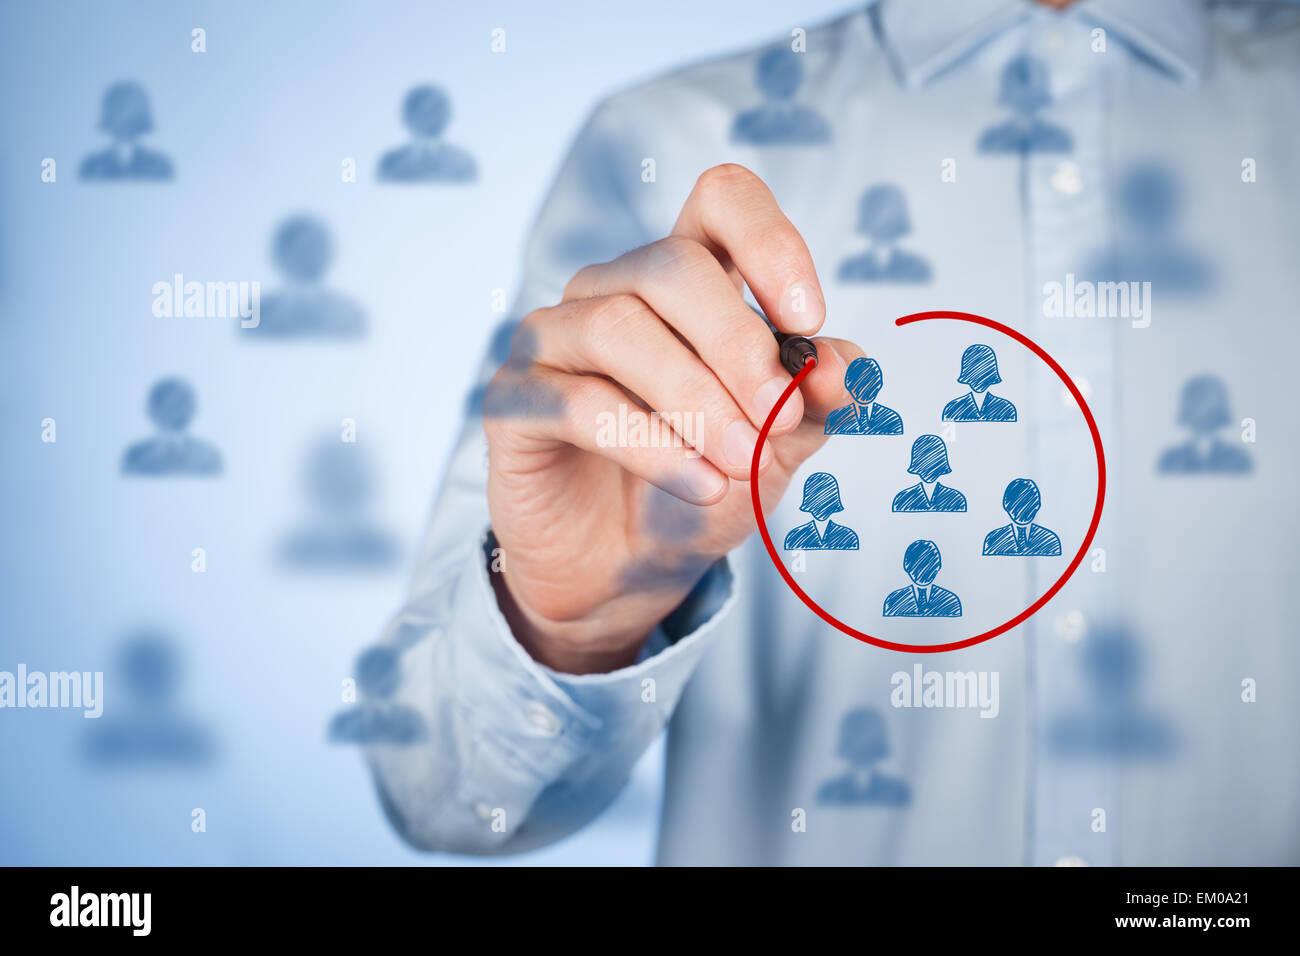 Marketing segmentation, target audience, customers care, customer relationship management (CRM), customer analysis - Stock Image